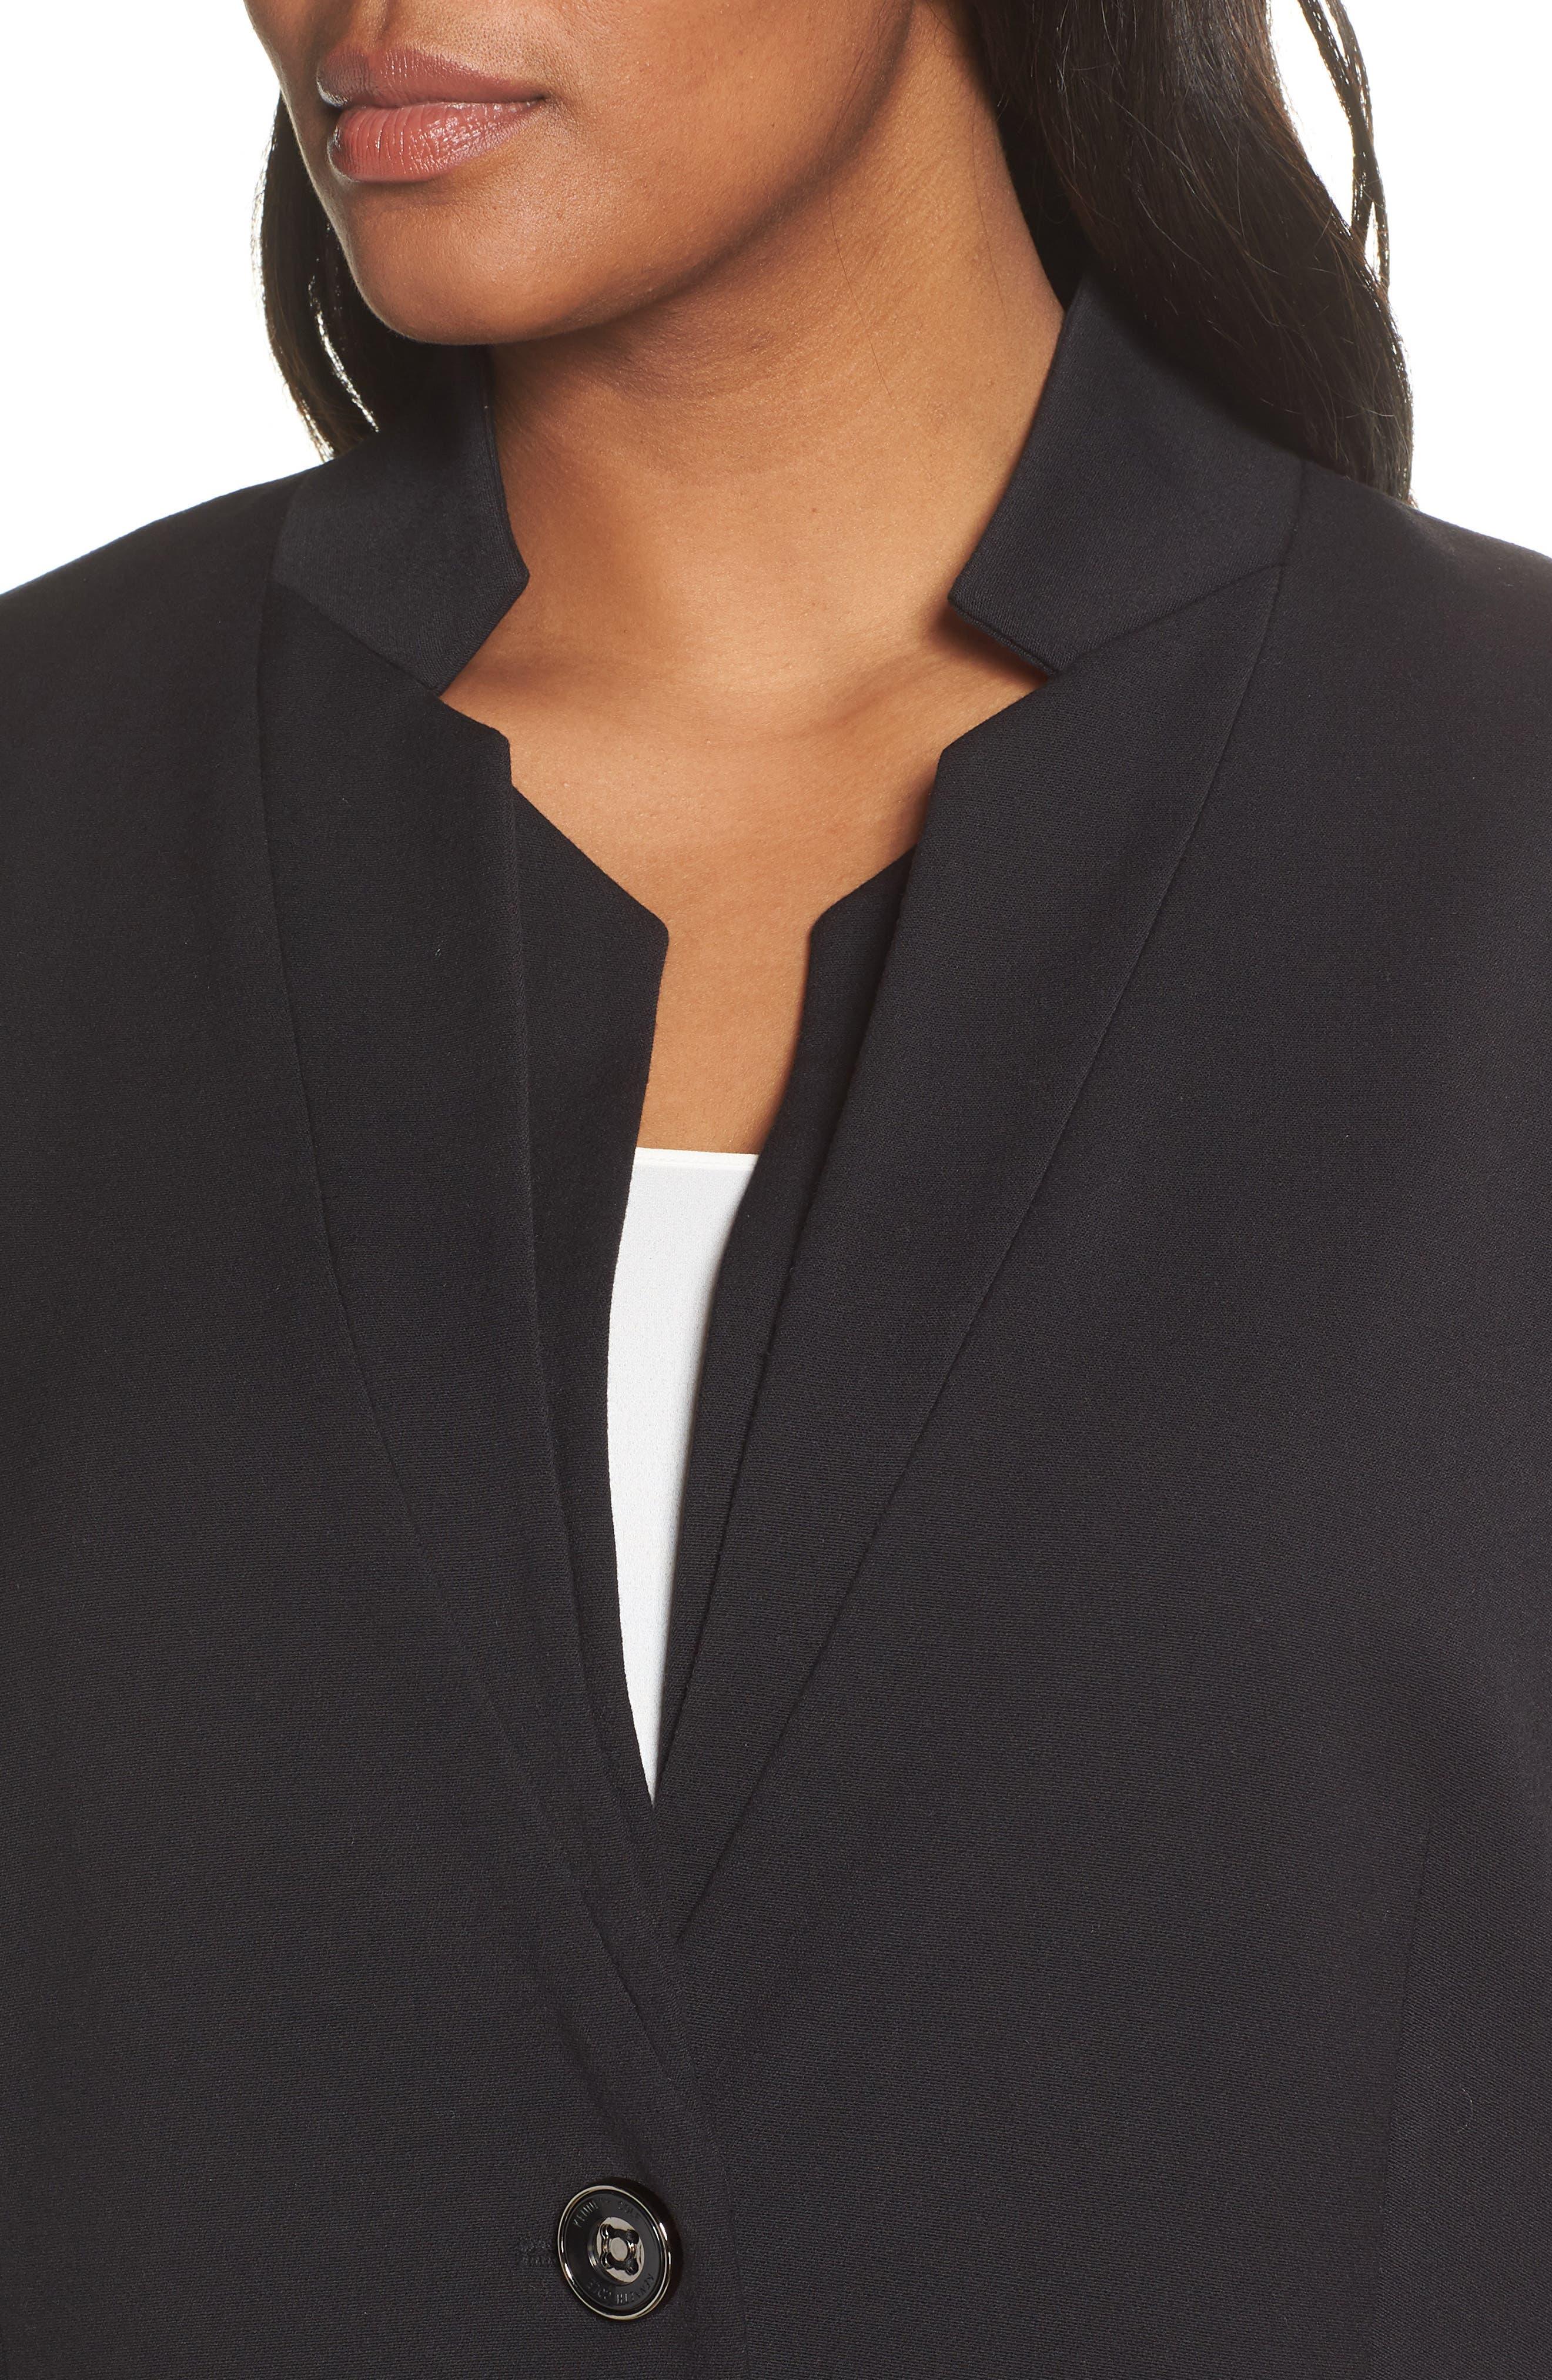 KENNETH COLE NEW YORK,                             Inverted Collar Ponte Jacket,                             Alternate thumbnail 4, color,                             BLACK